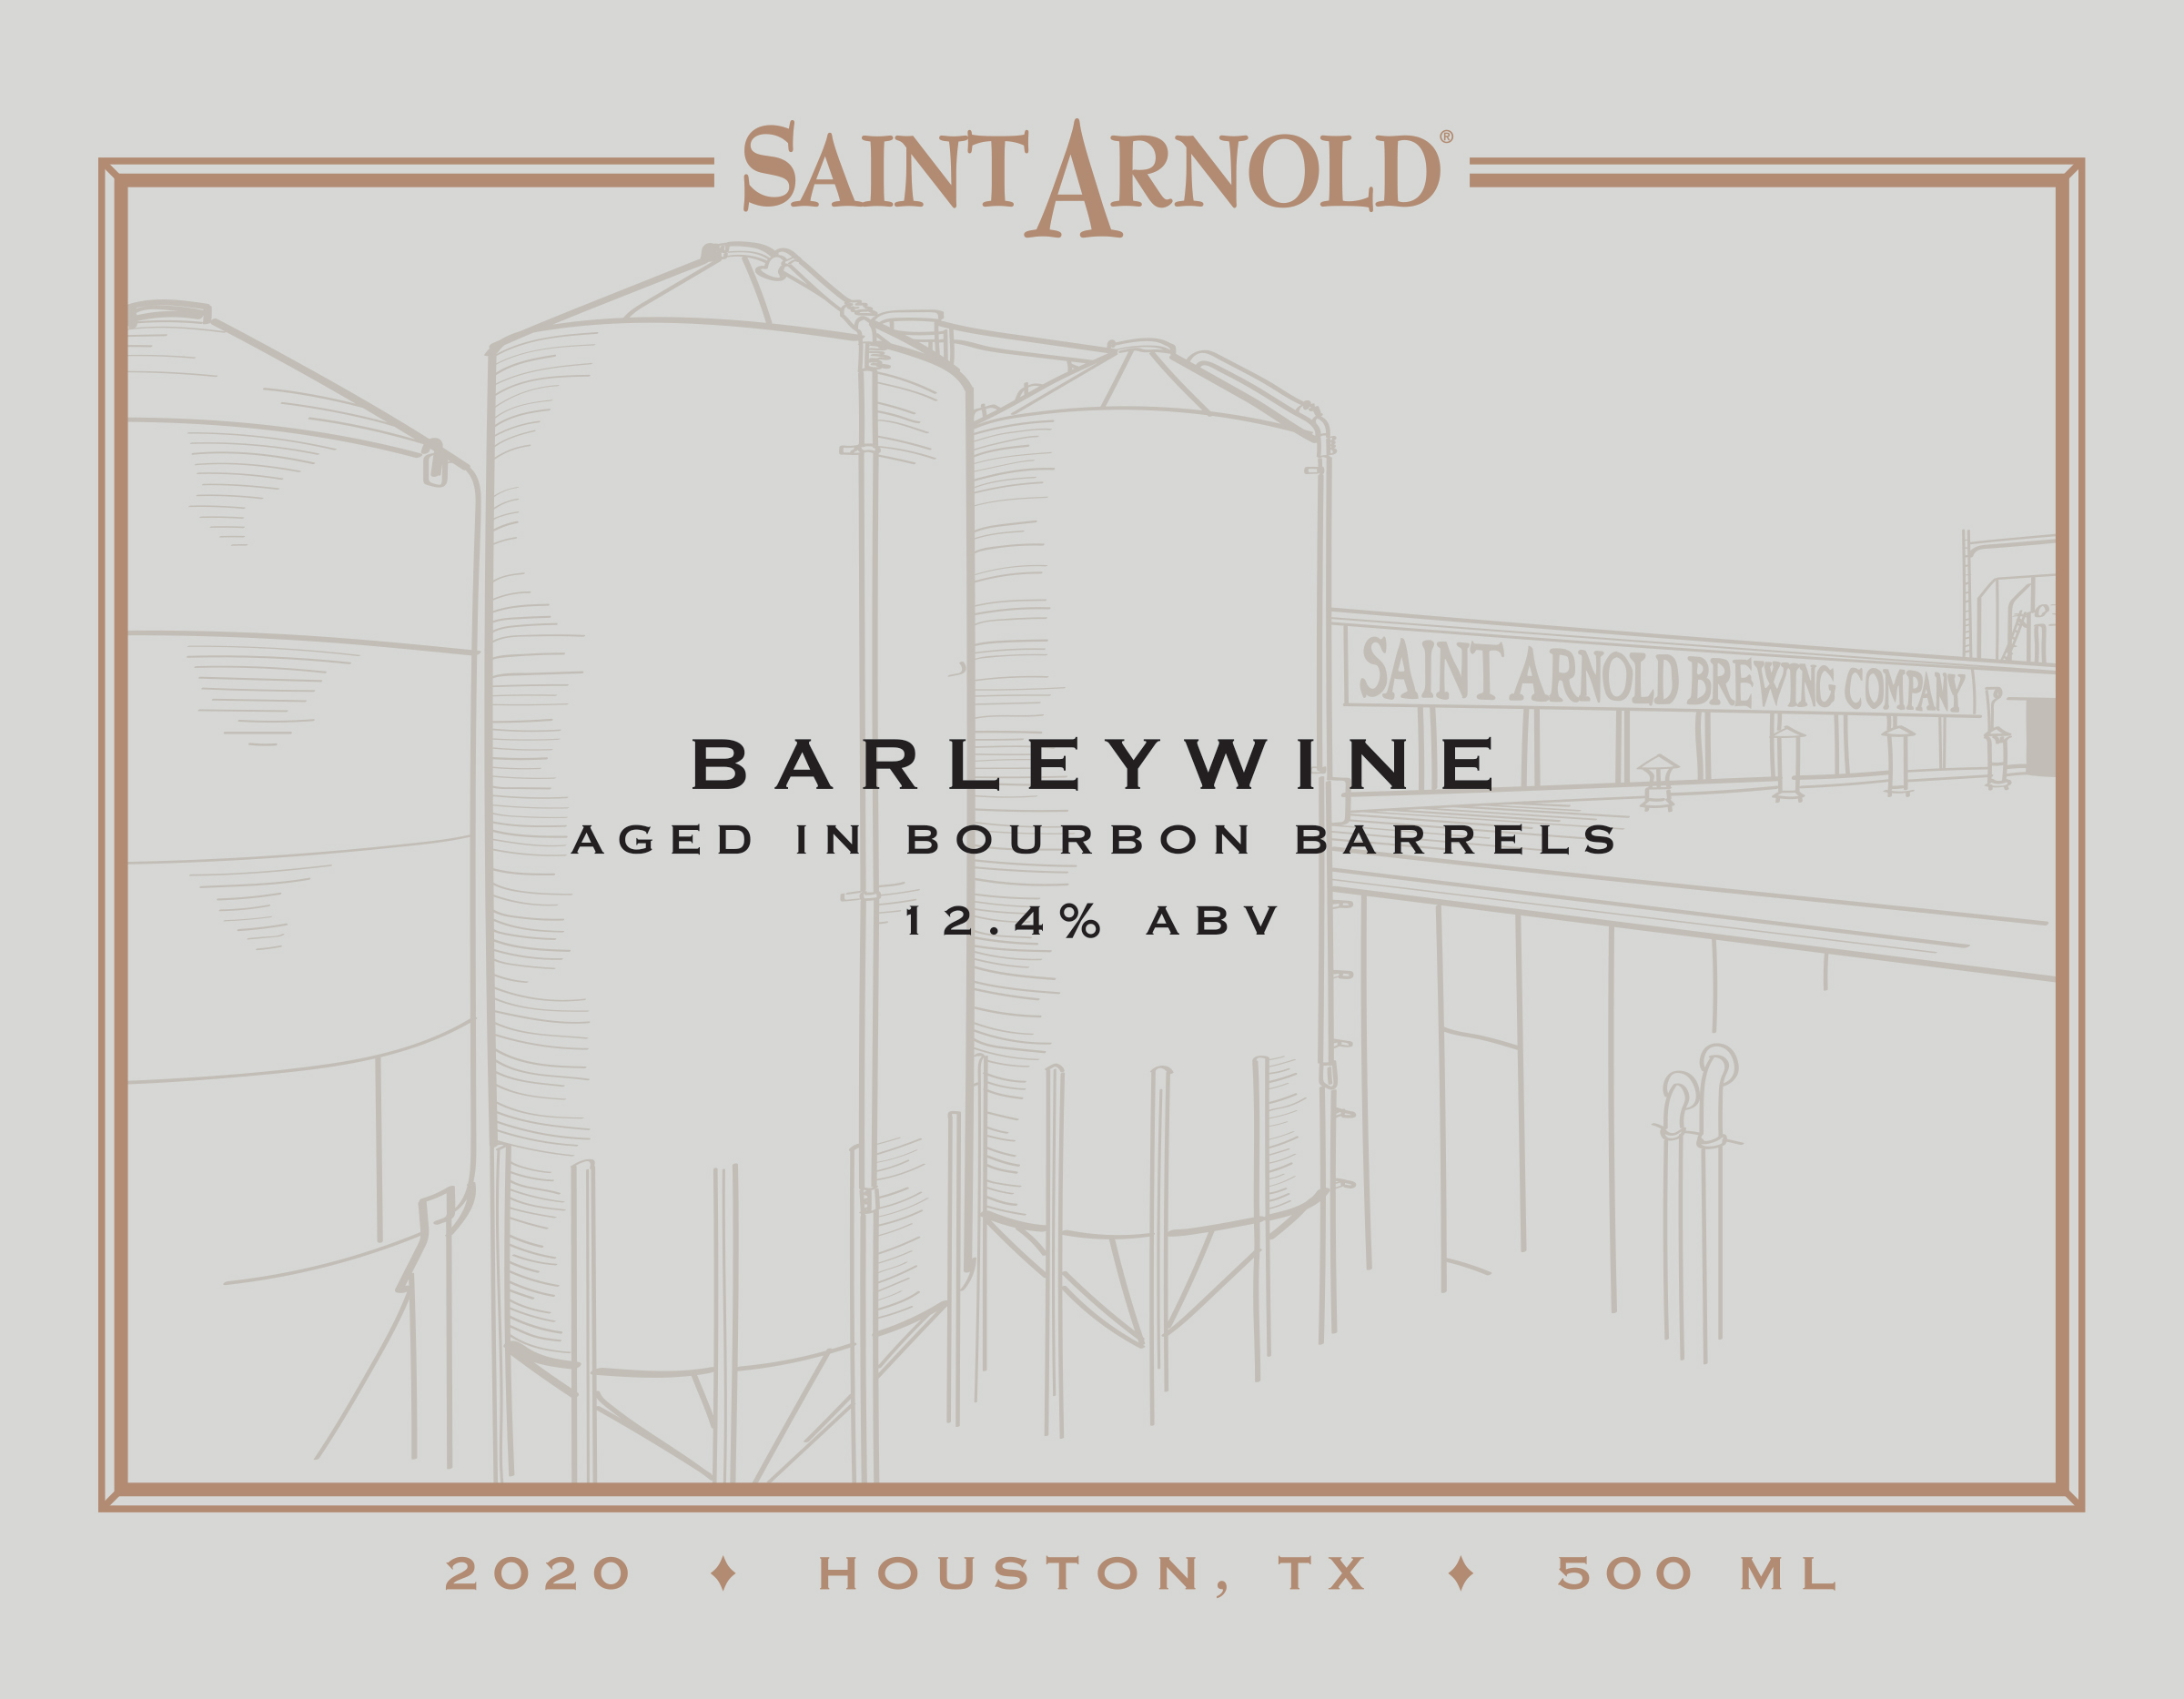 02_barleywine_aged_in_bourbon_barrels_2020